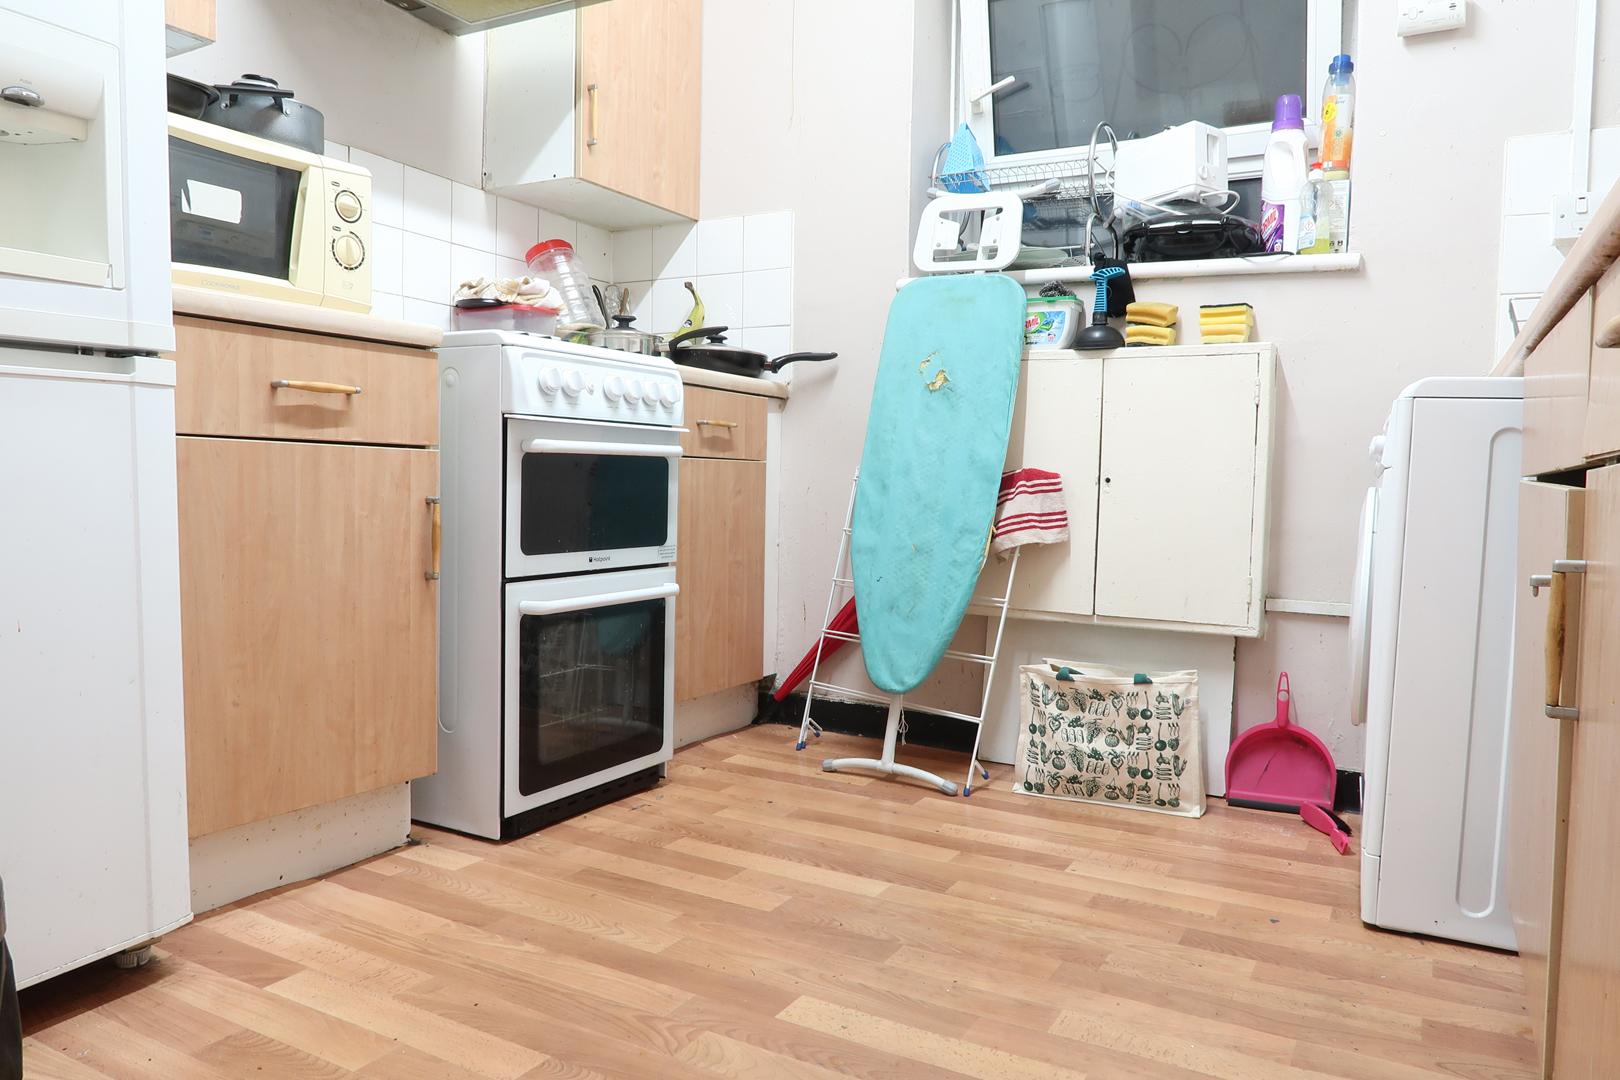 Apartment LIMBOROUGH HOUSE - DELUXE GUEST ROOM 4 photo 20296214